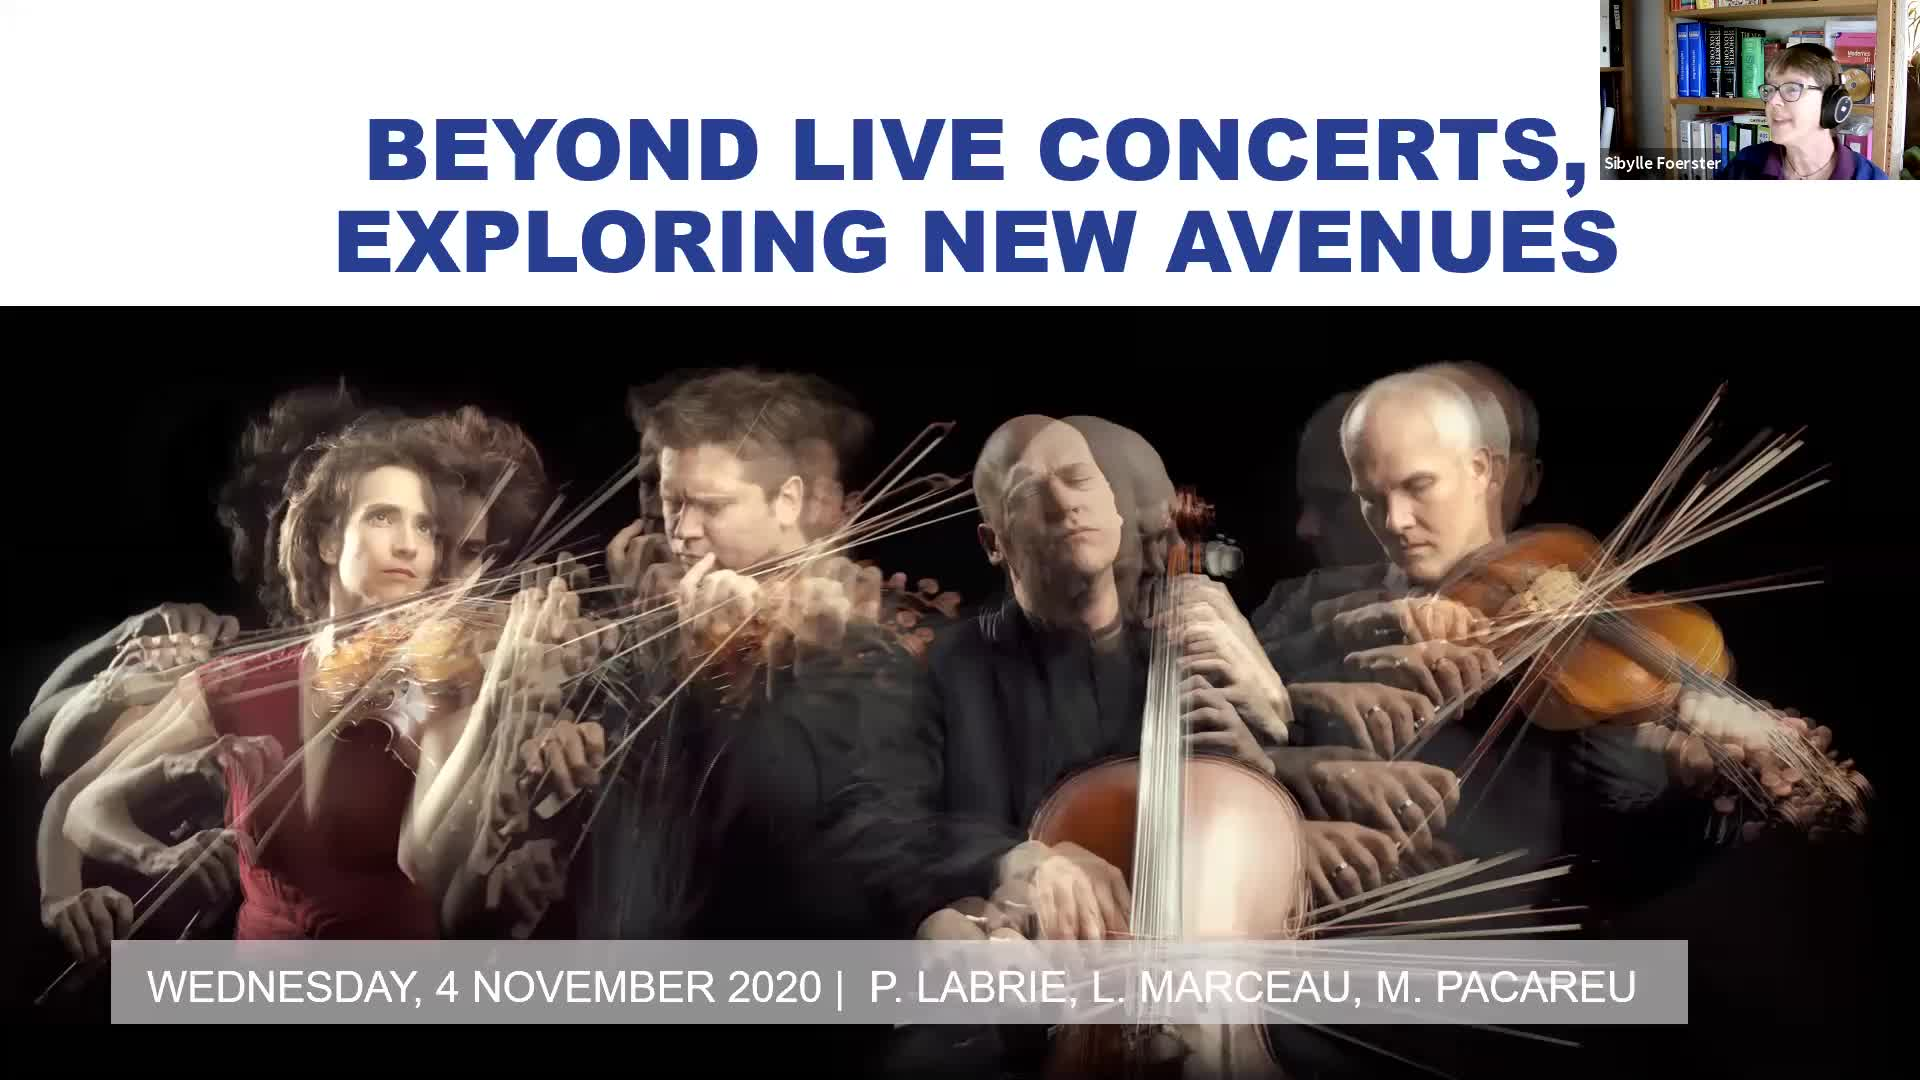 Beyond live concerts, exploring new avenues